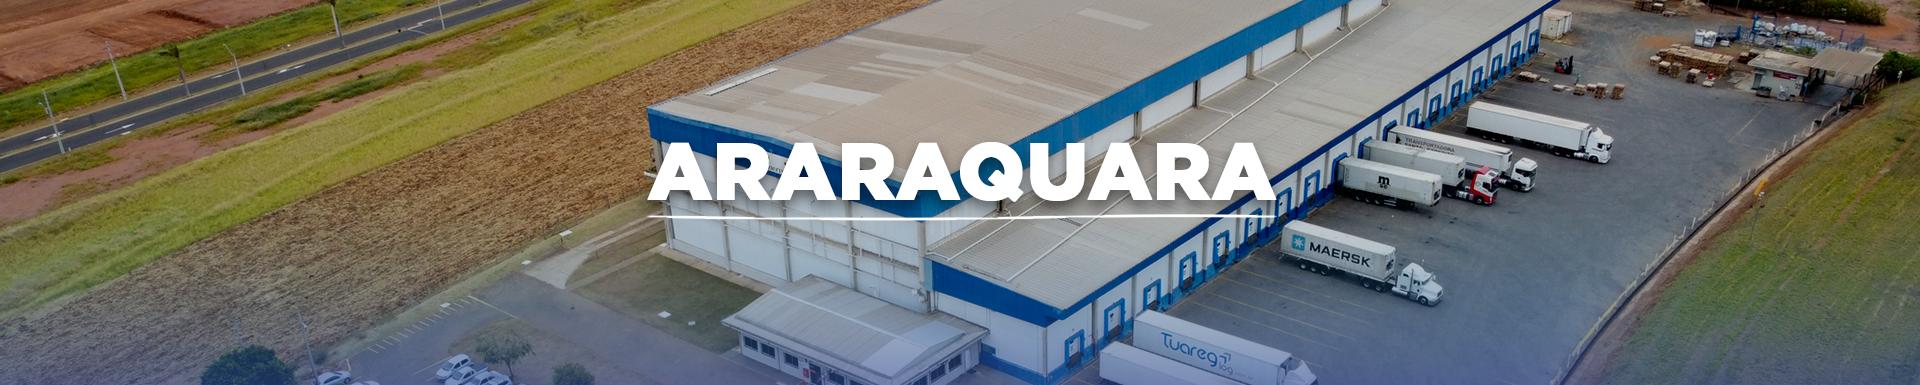 Banner Araraquara